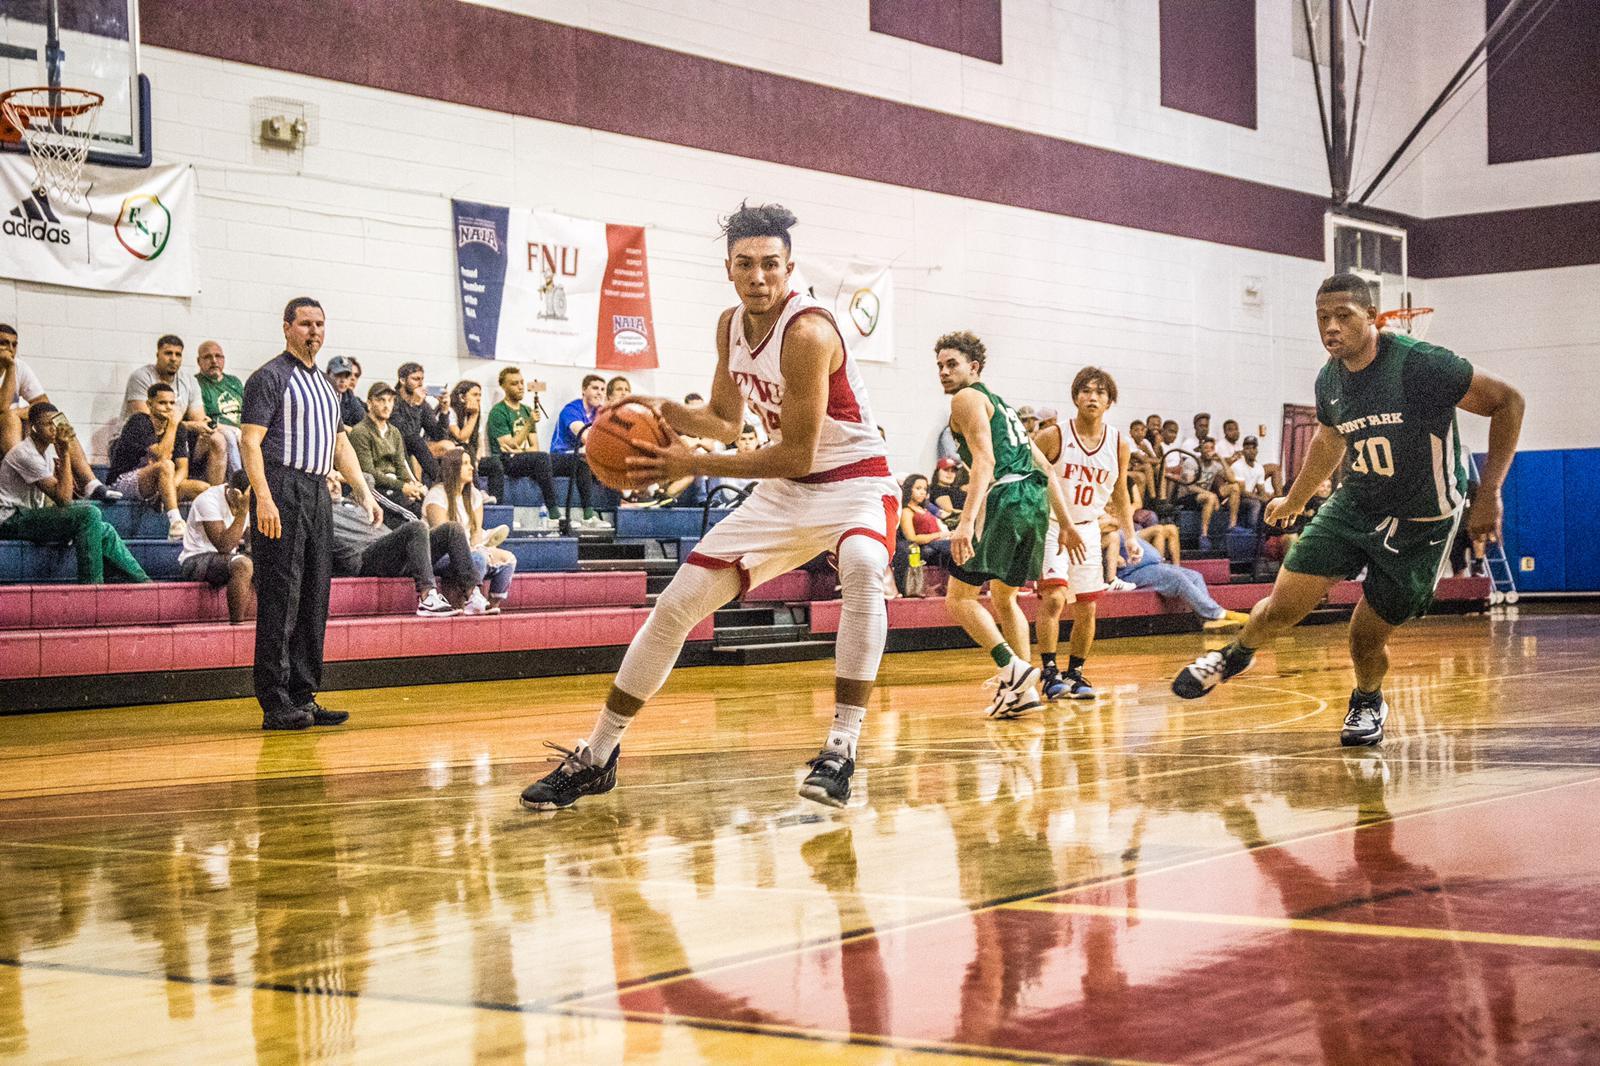 Men's basketball player Nico Rojas holding the ball